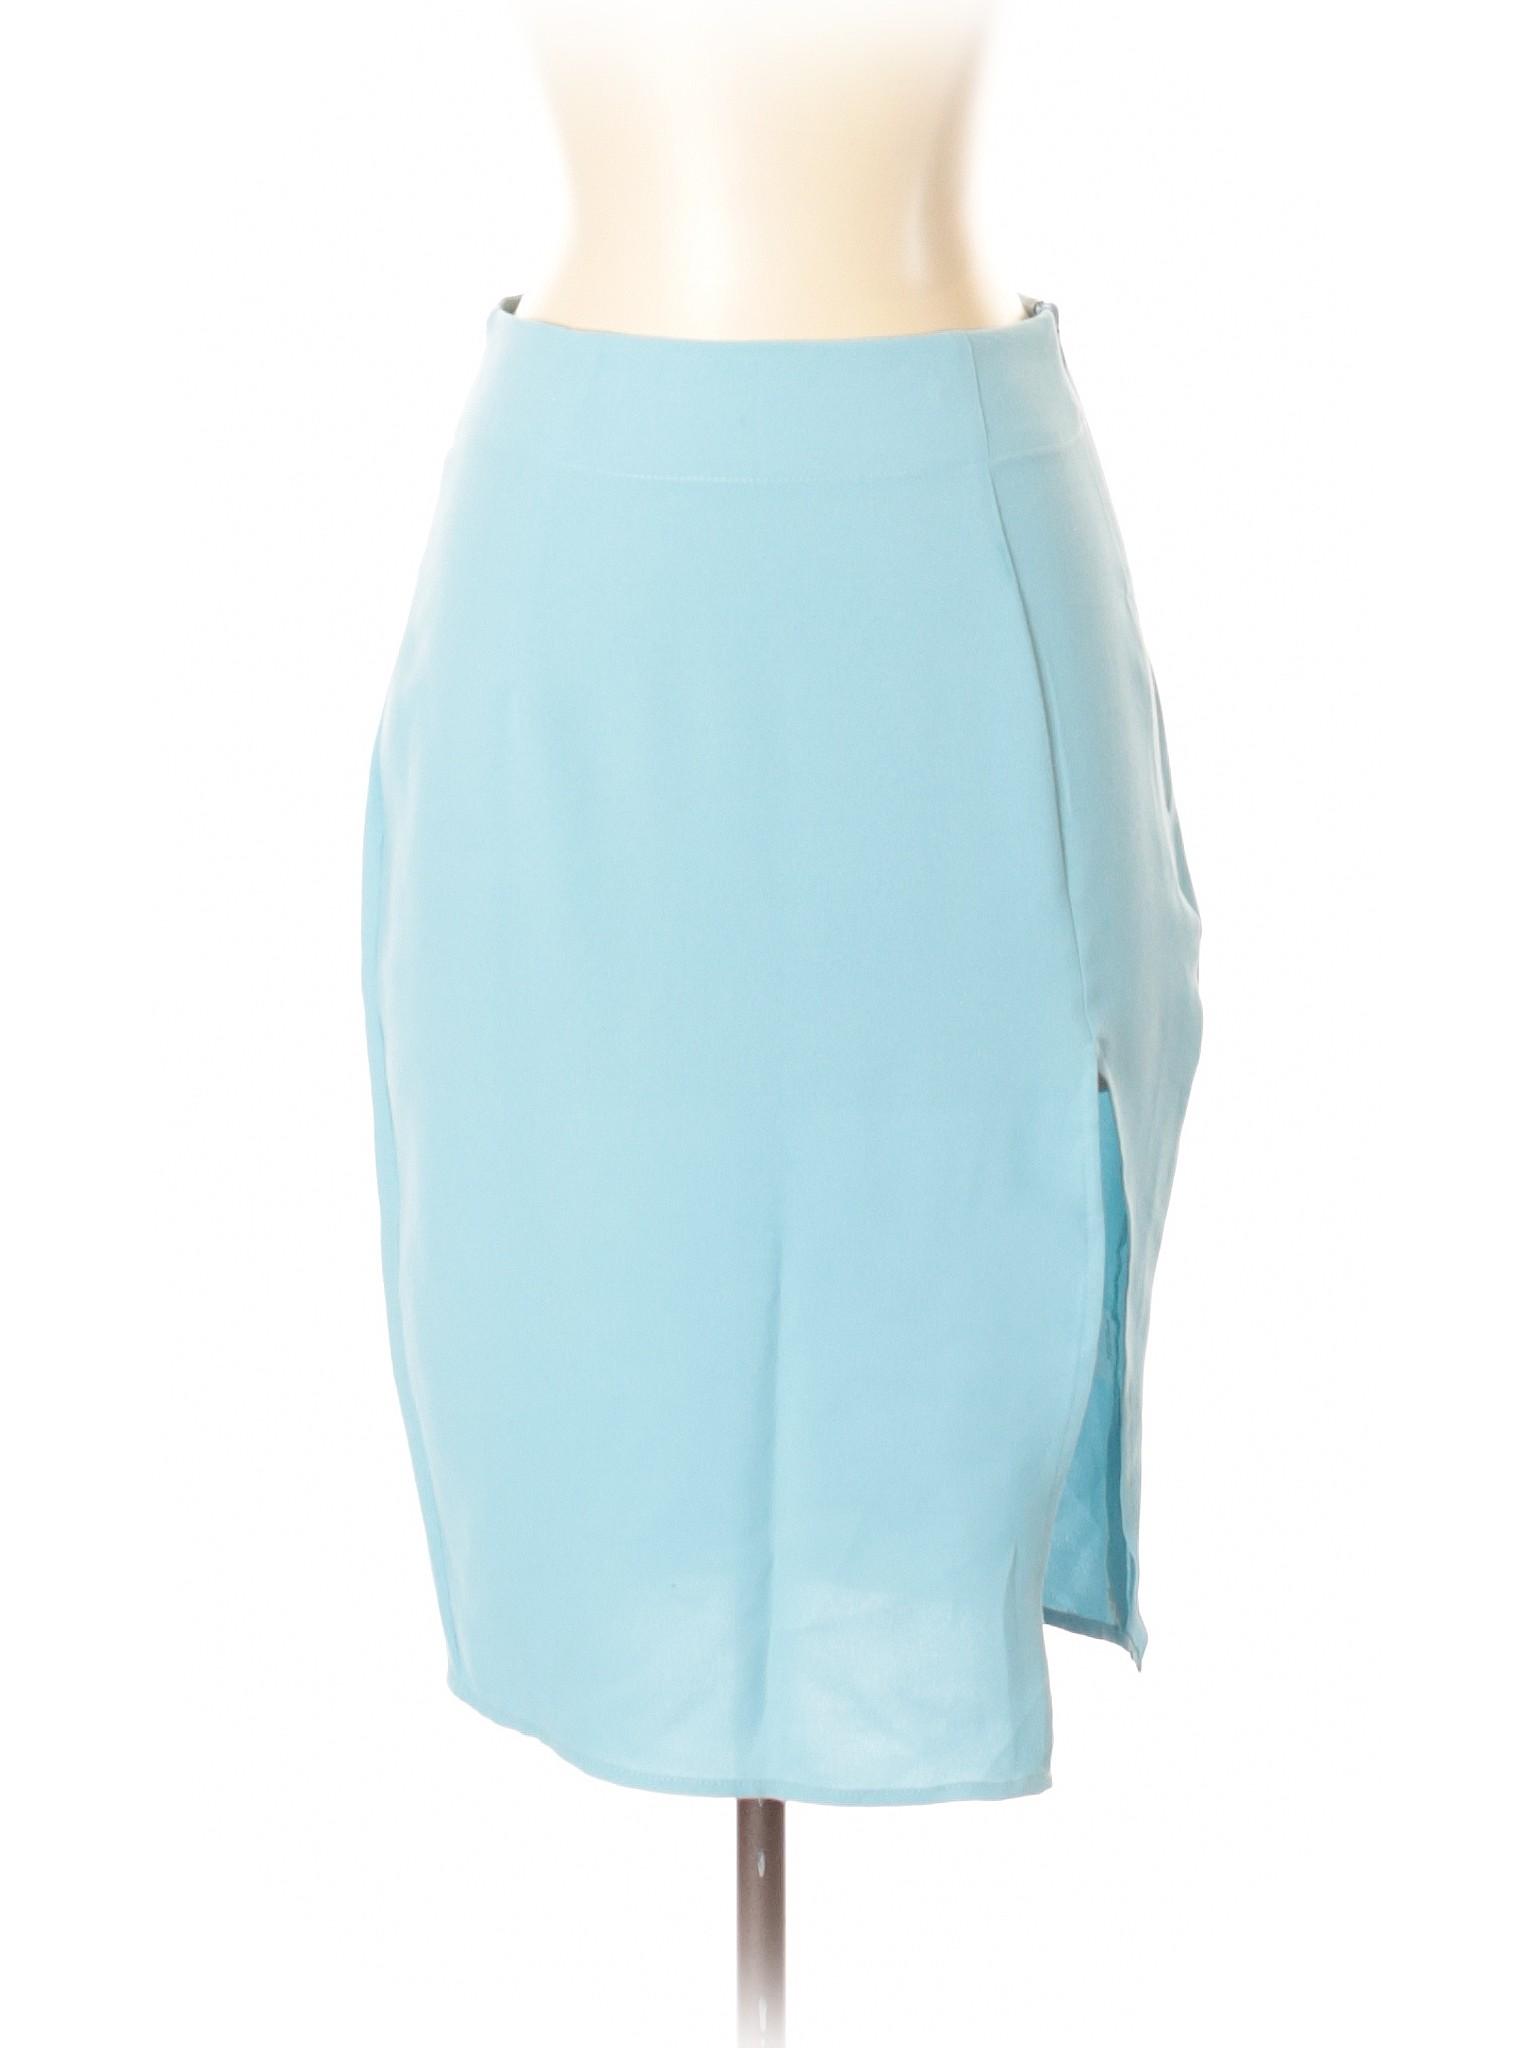 Boutique Boutique Skirt Boutique Casual Casual Skirt RrwHqzRx